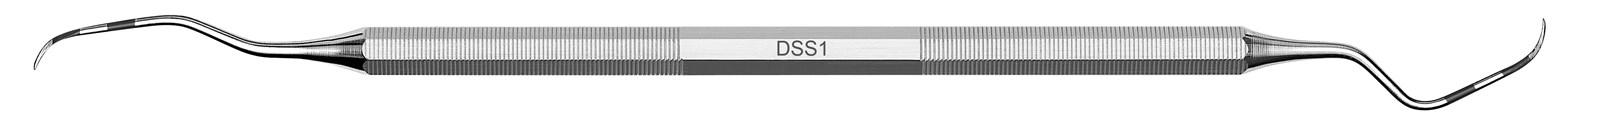 Kyreta Deppeler smart scaling (DSS) - DSS1, ADEP světle modrý